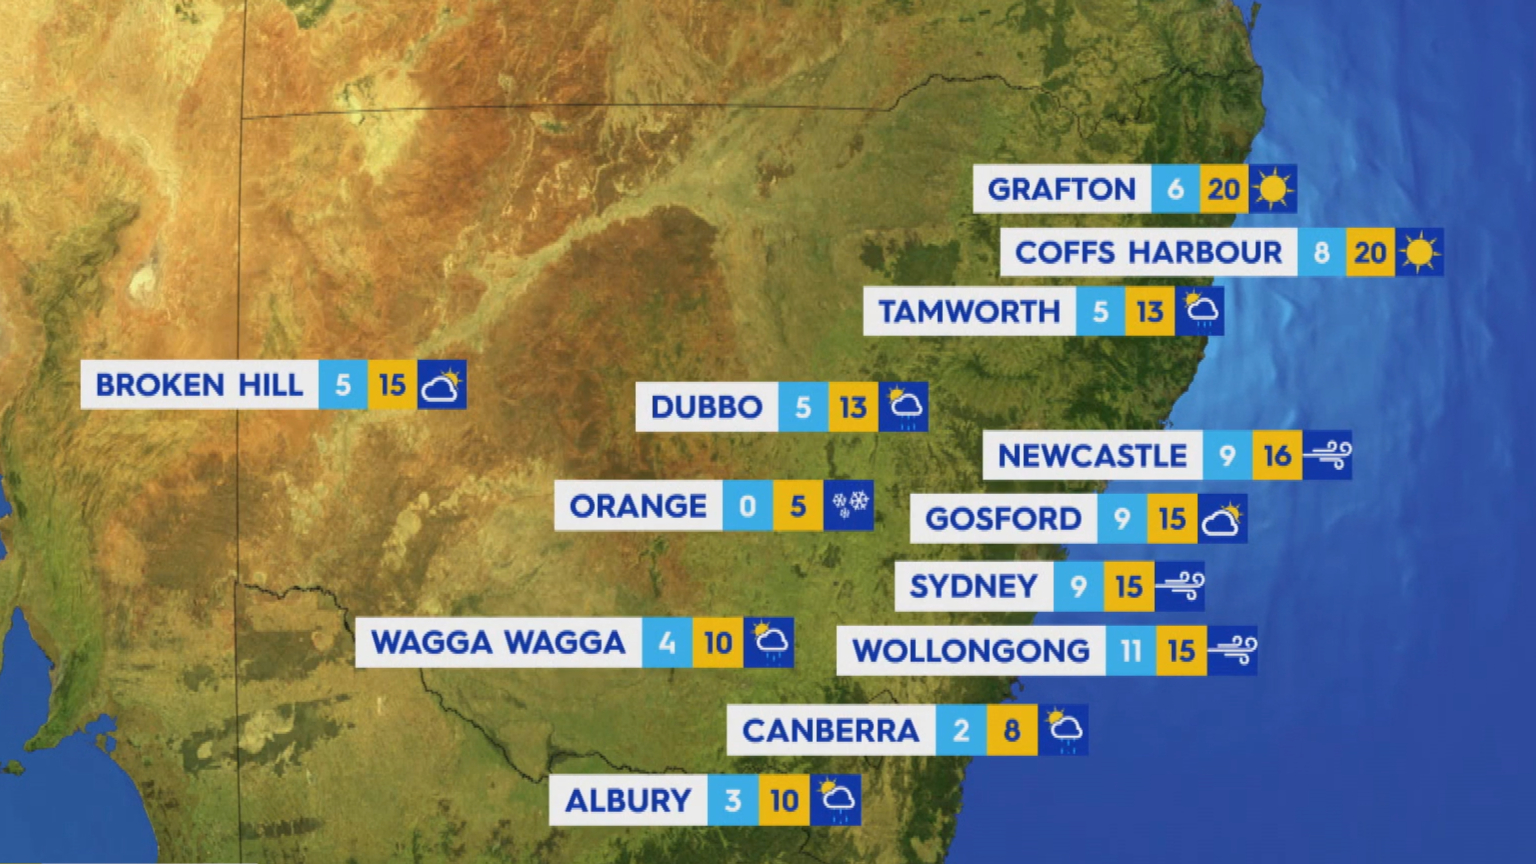 National weather forecast for Sunday, July 25